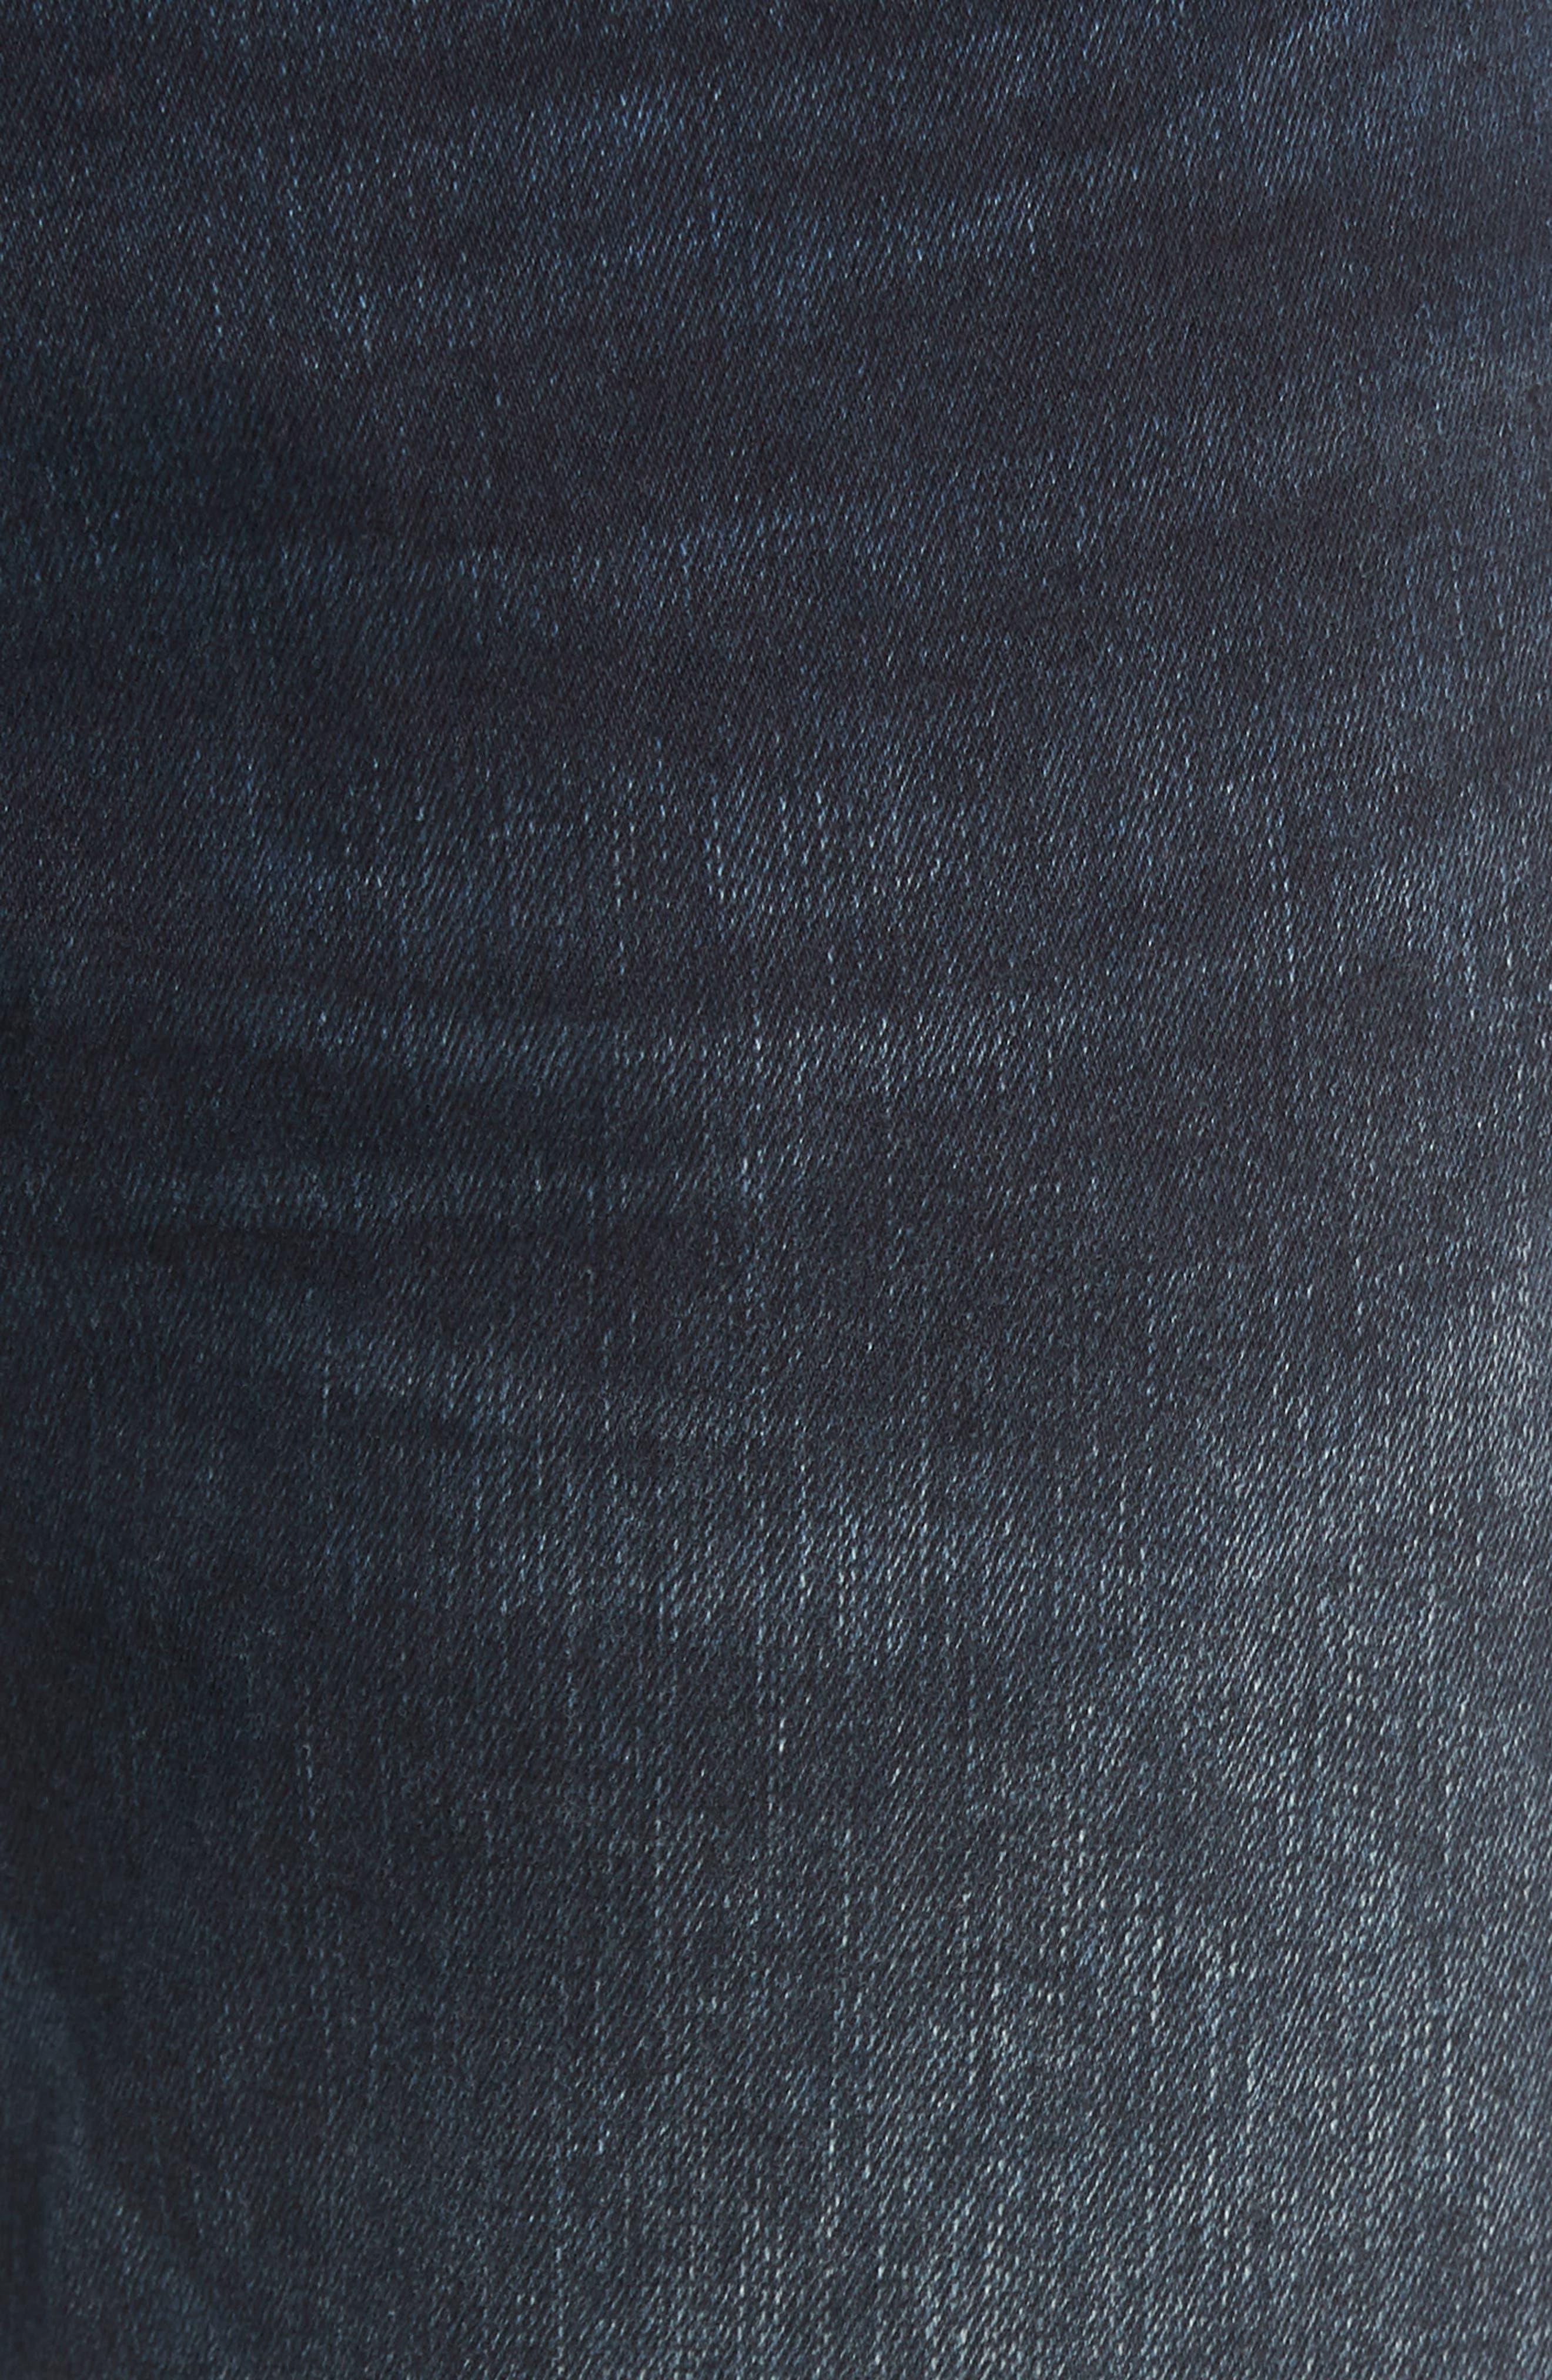 Jake Slim Fit Jeans,                             Alternate thumbnail 5, color,                             401